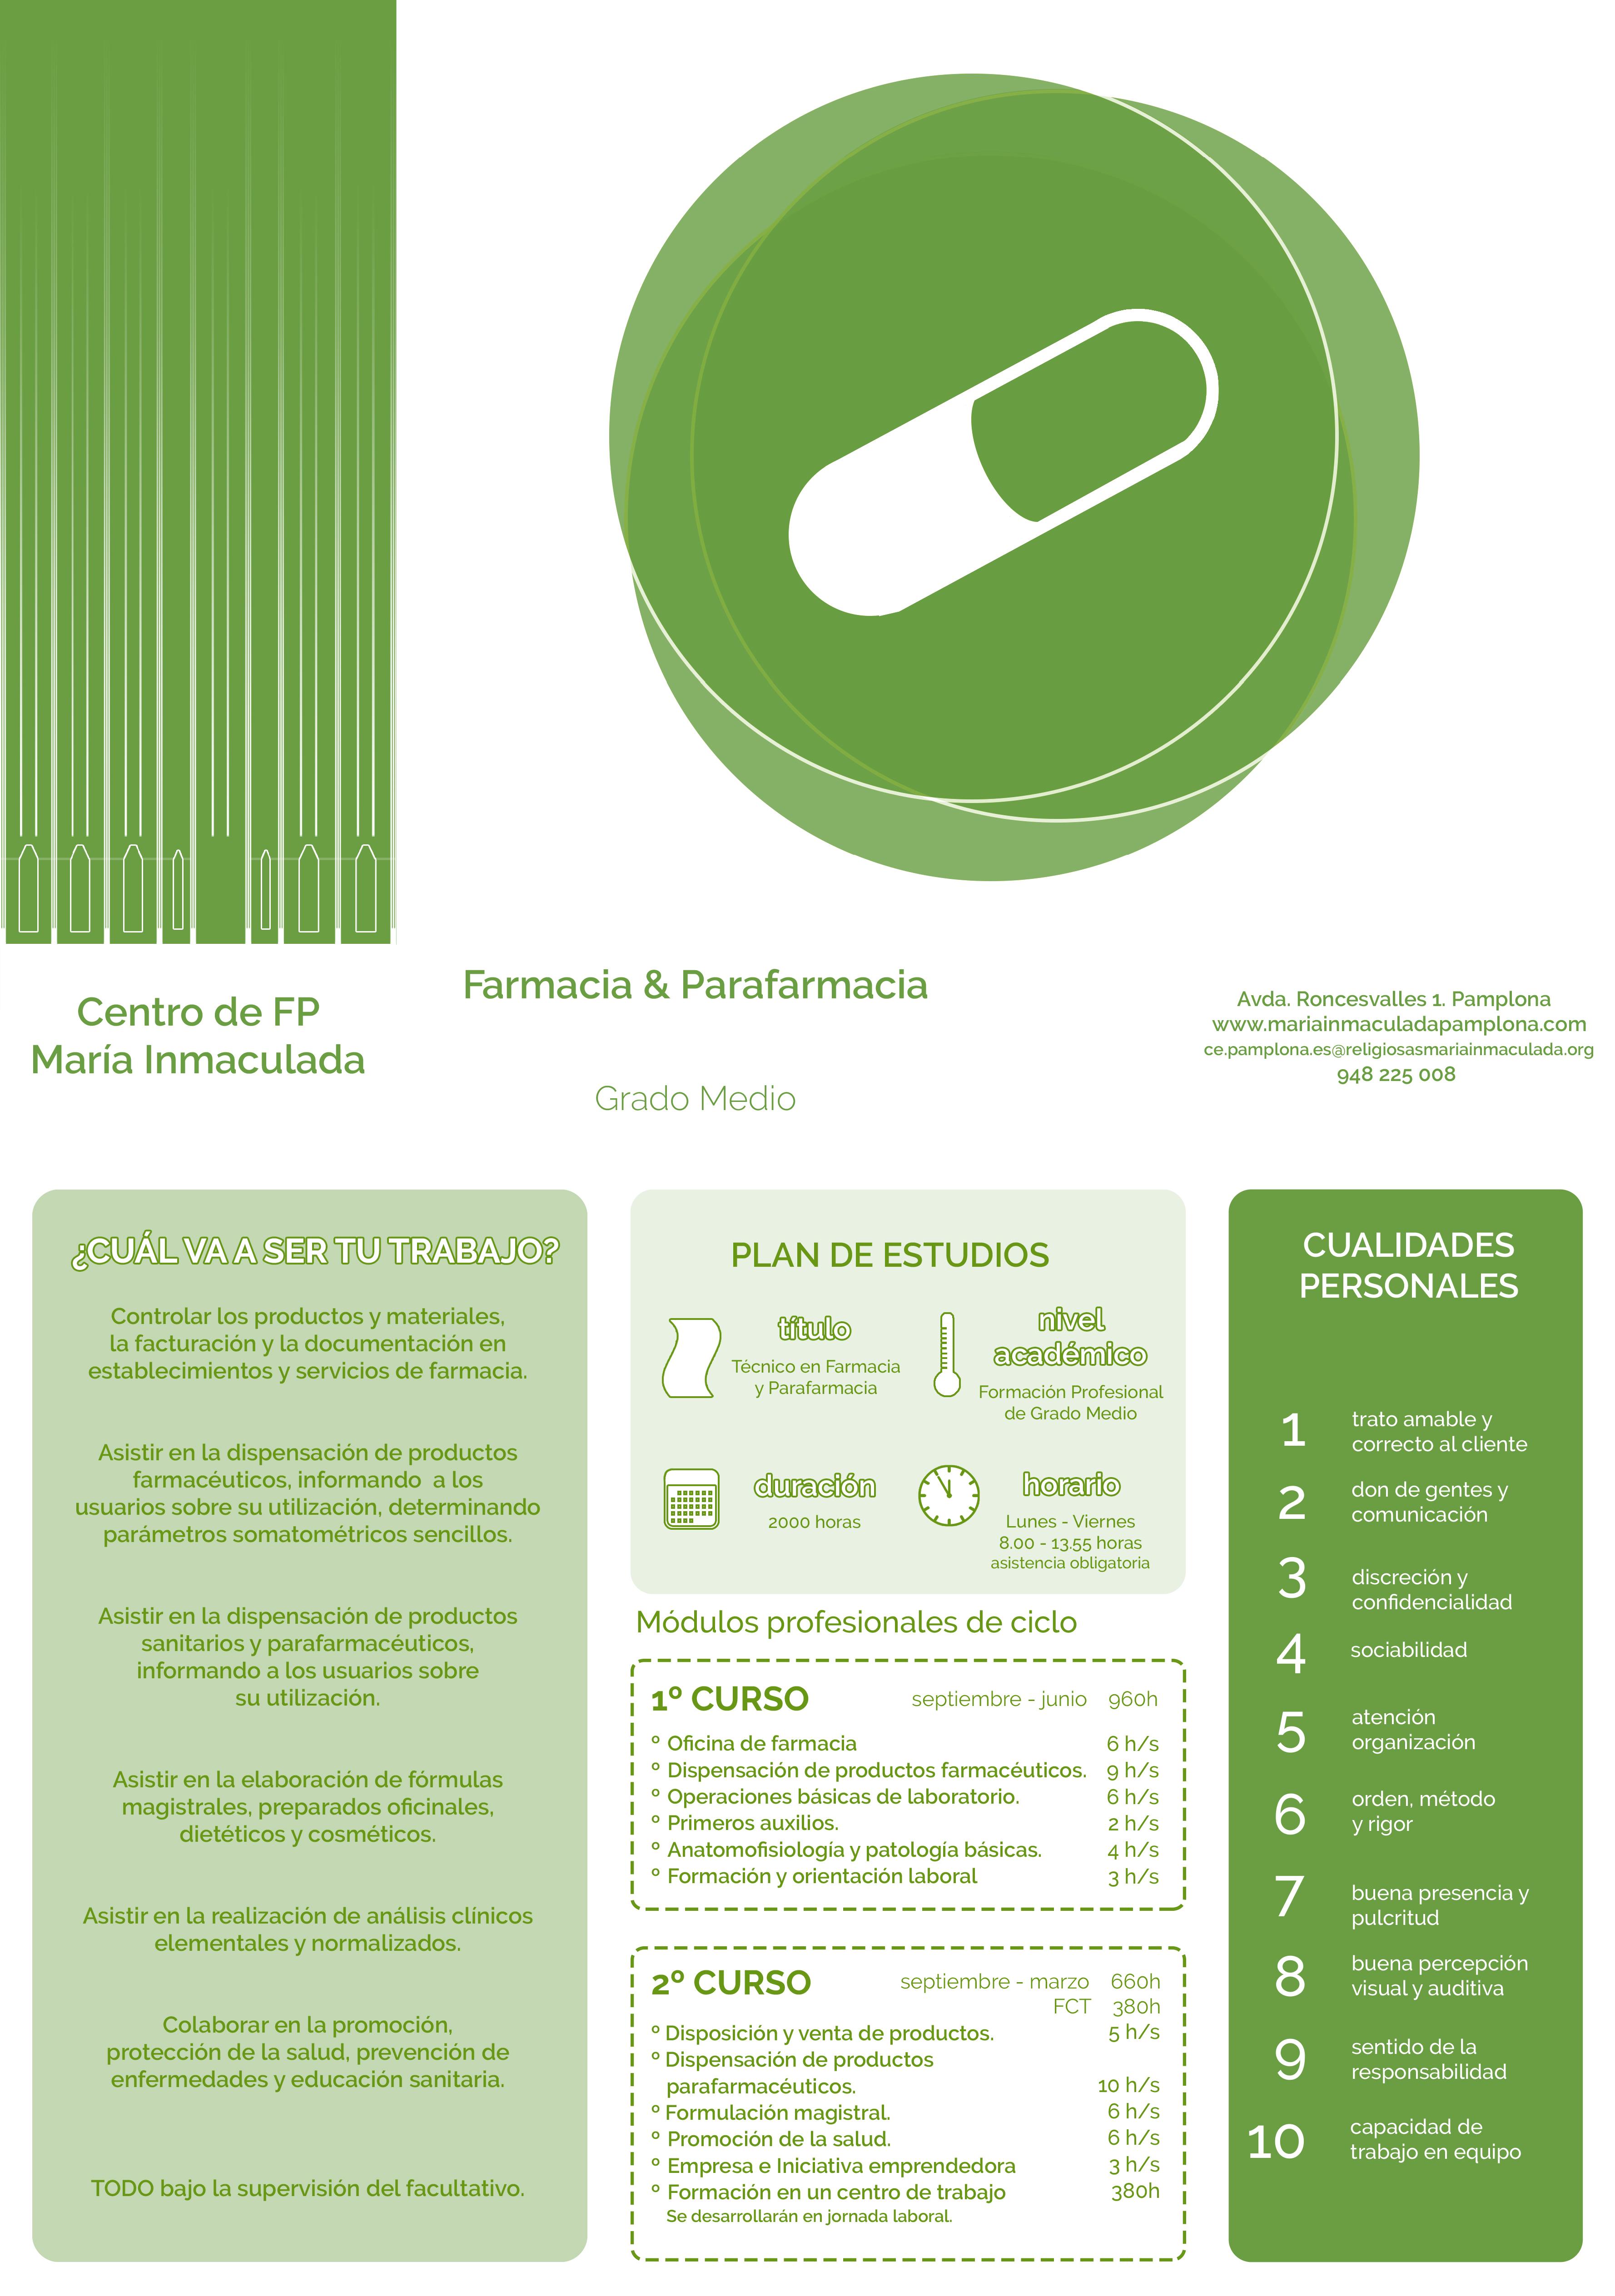 Farmacia Y Parafarmacia Mª Inmaculada Pamplona